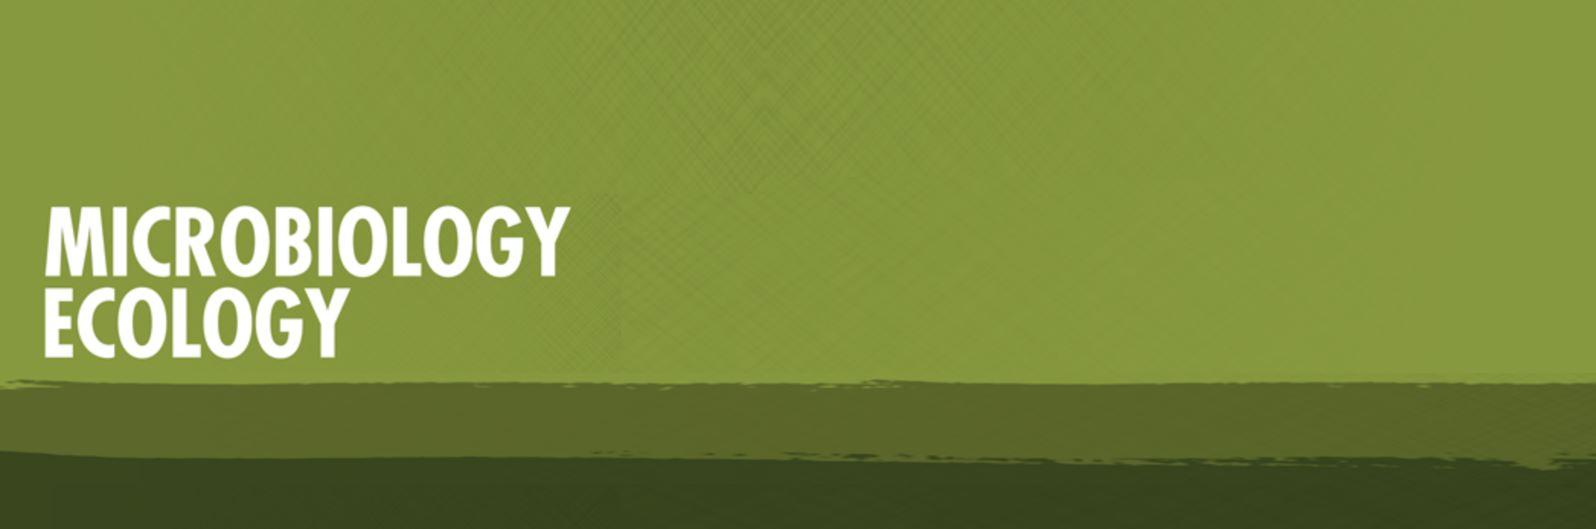 bg-overlay